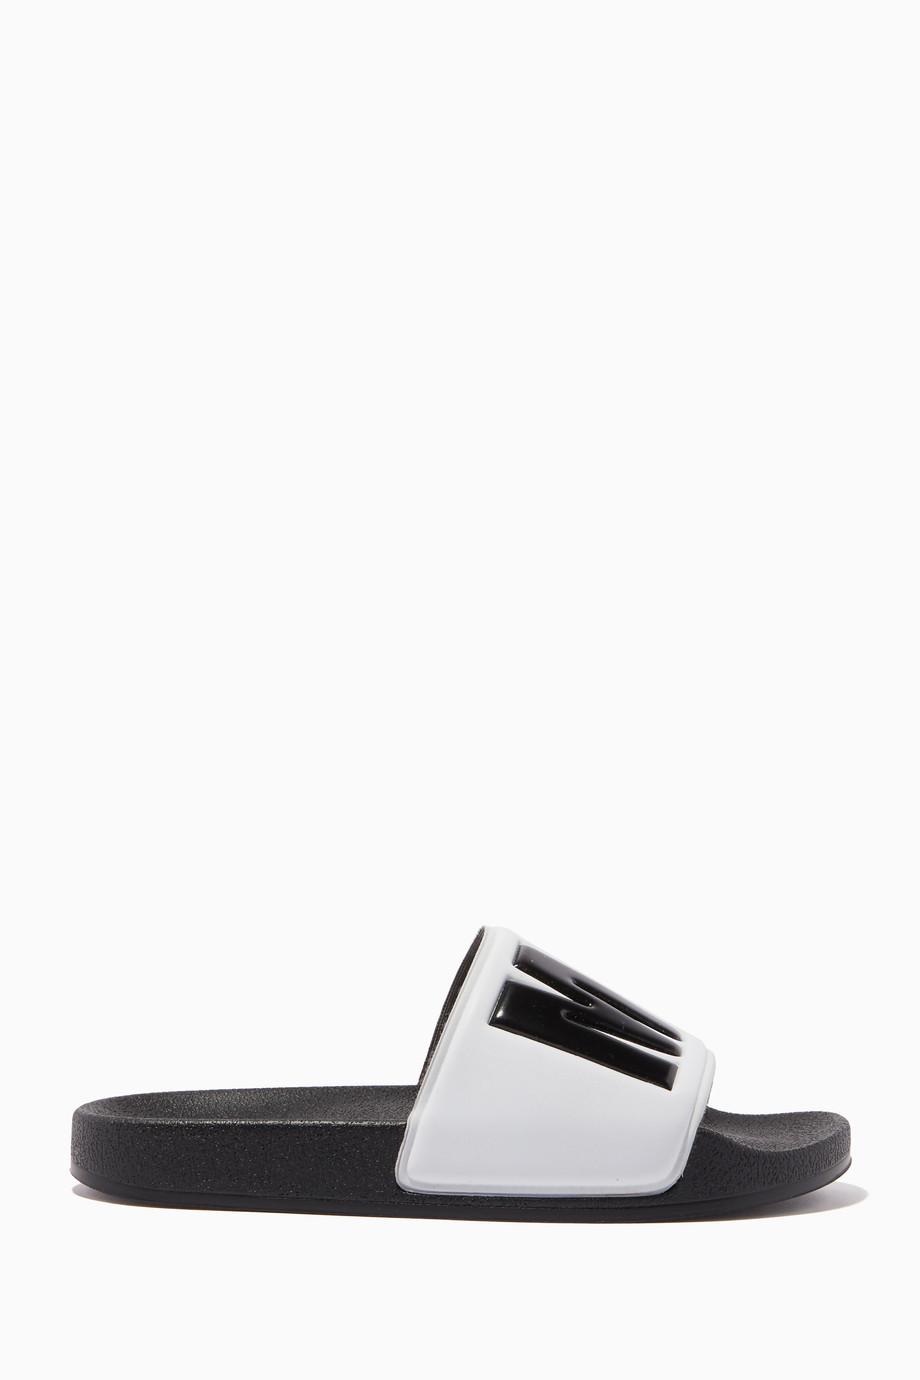 259a79f23c0a2 Shop MSGM White Logo Print Slide Sandals for Kids | Ounass UAE